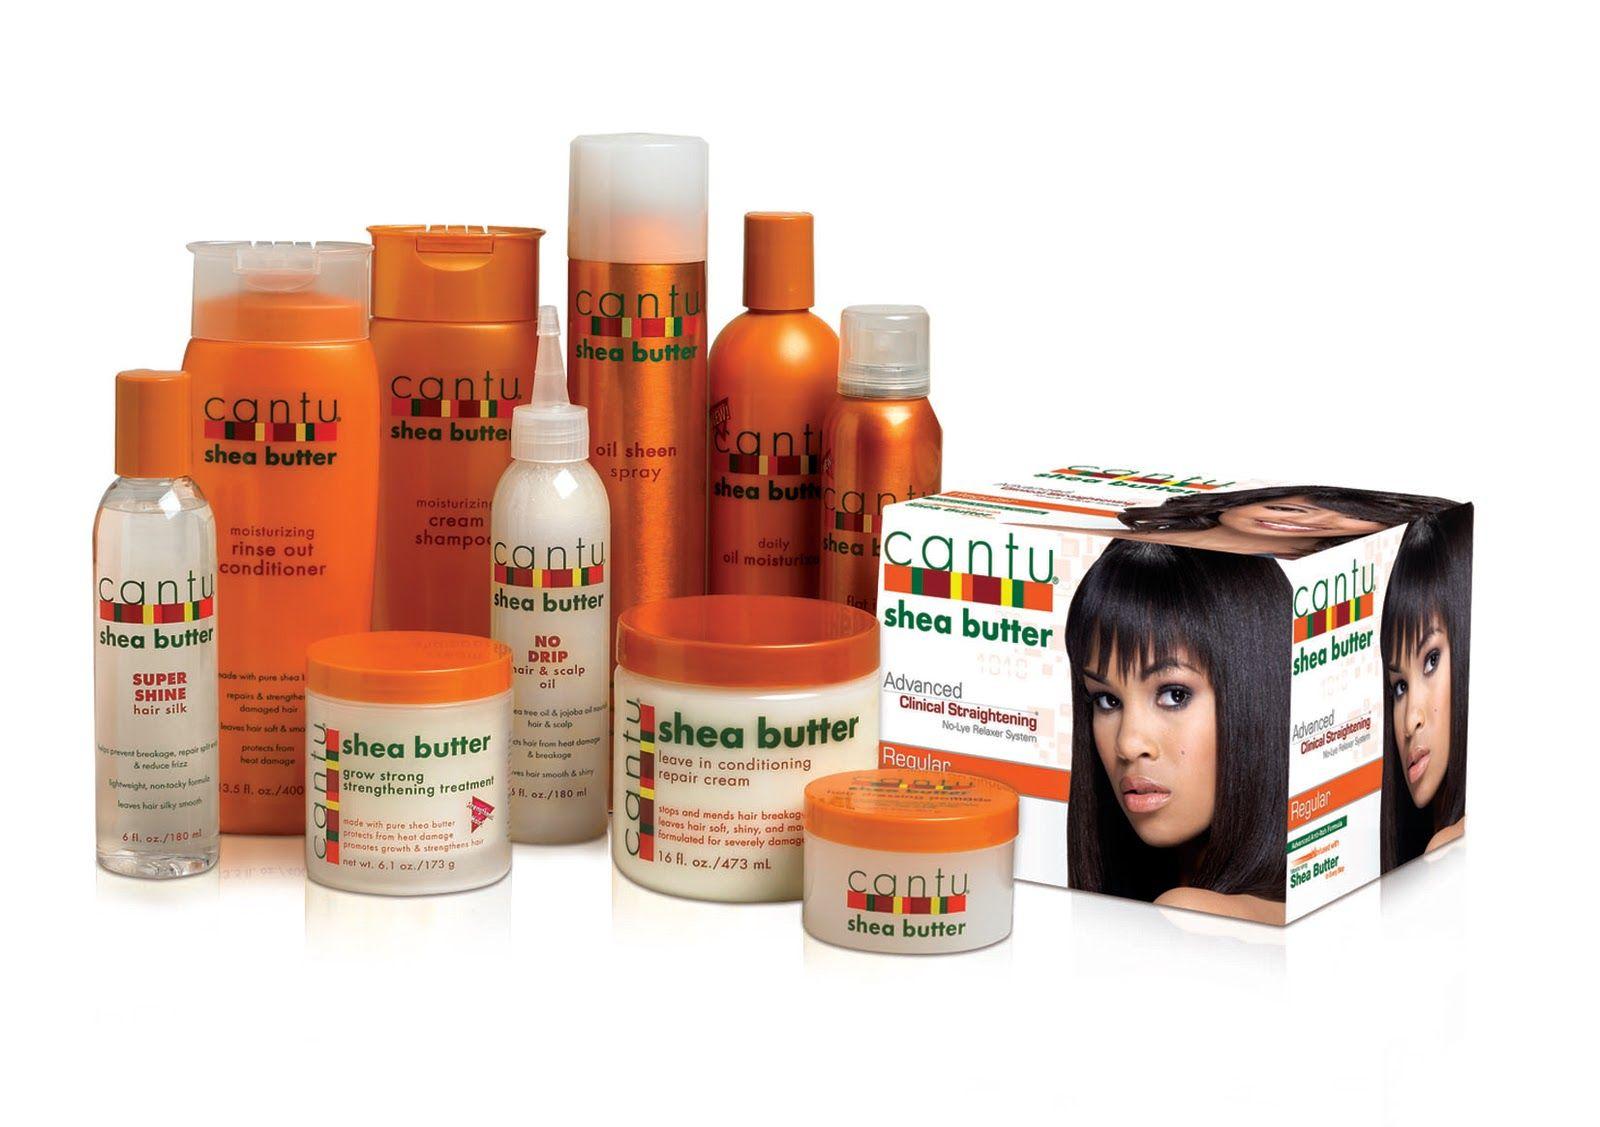 Cantu Shea Butter Natural Hair Products Walgreens Maybe Wal